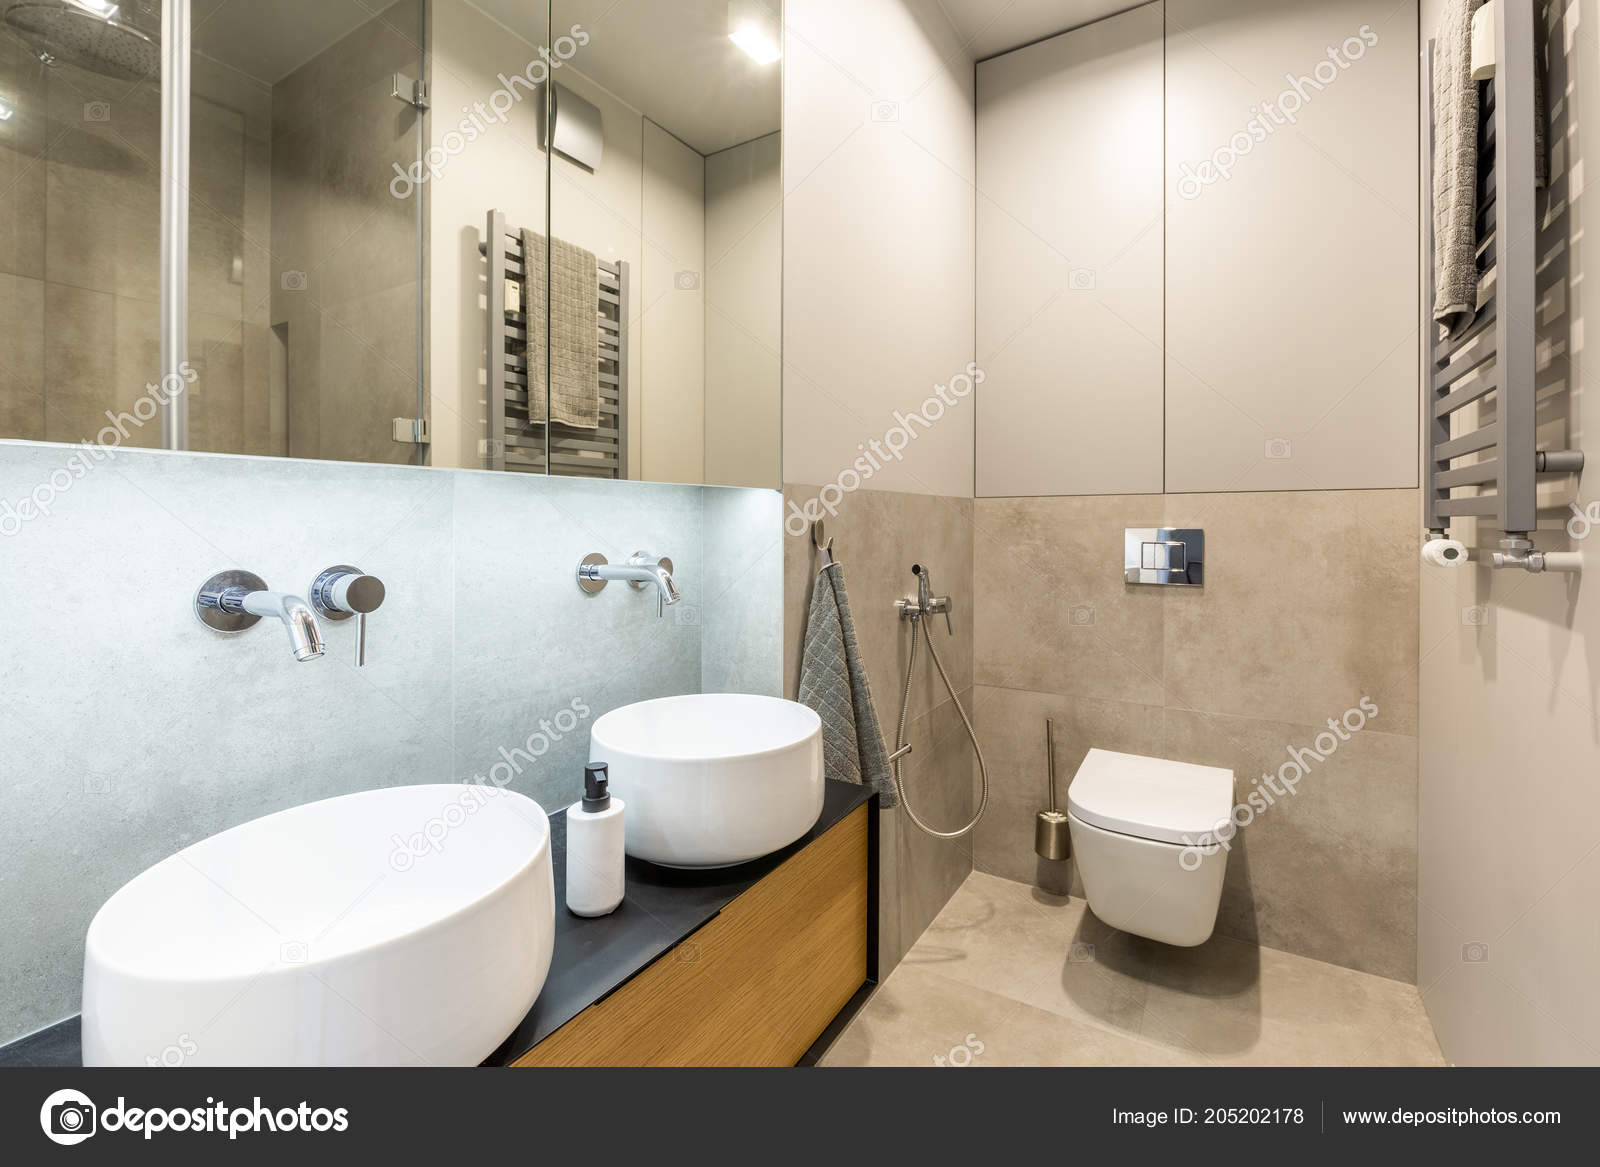 Modern Badkamer Interieur : Stijlvolle moderne badkamer interieur met beige marmeren tegels